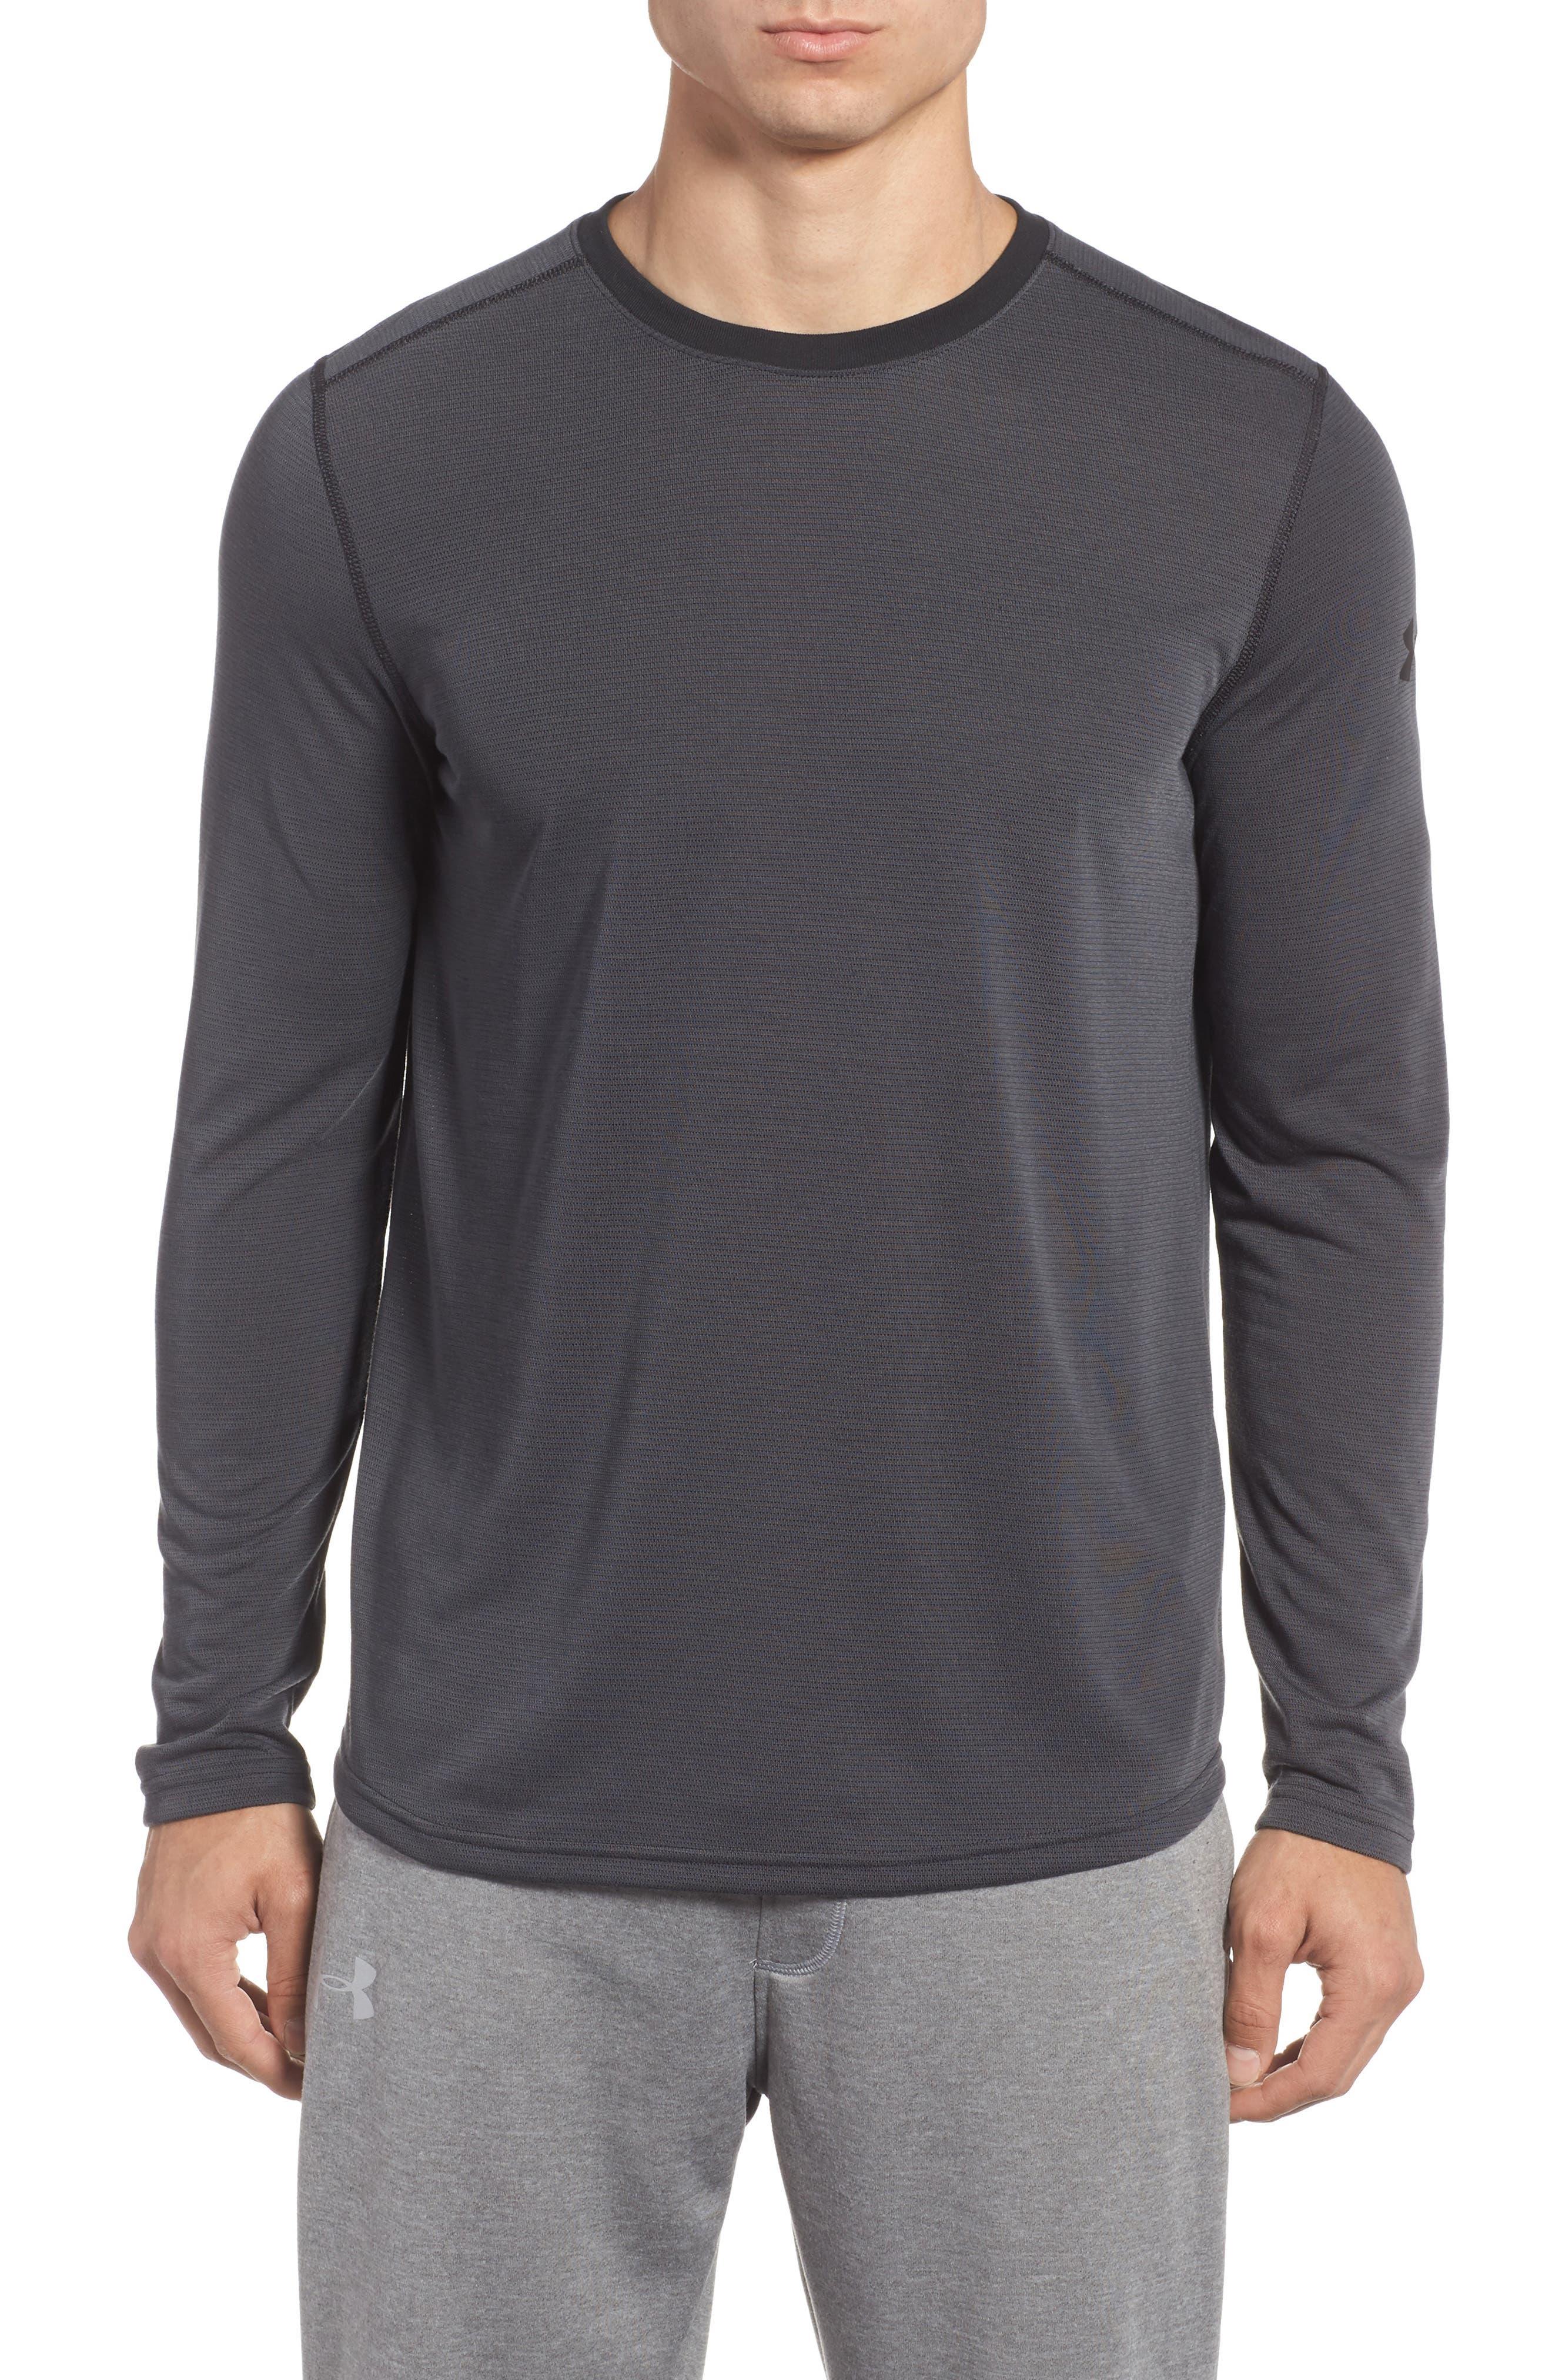 Threadborne Performance T-Shirt,                         Main,                         color, 020